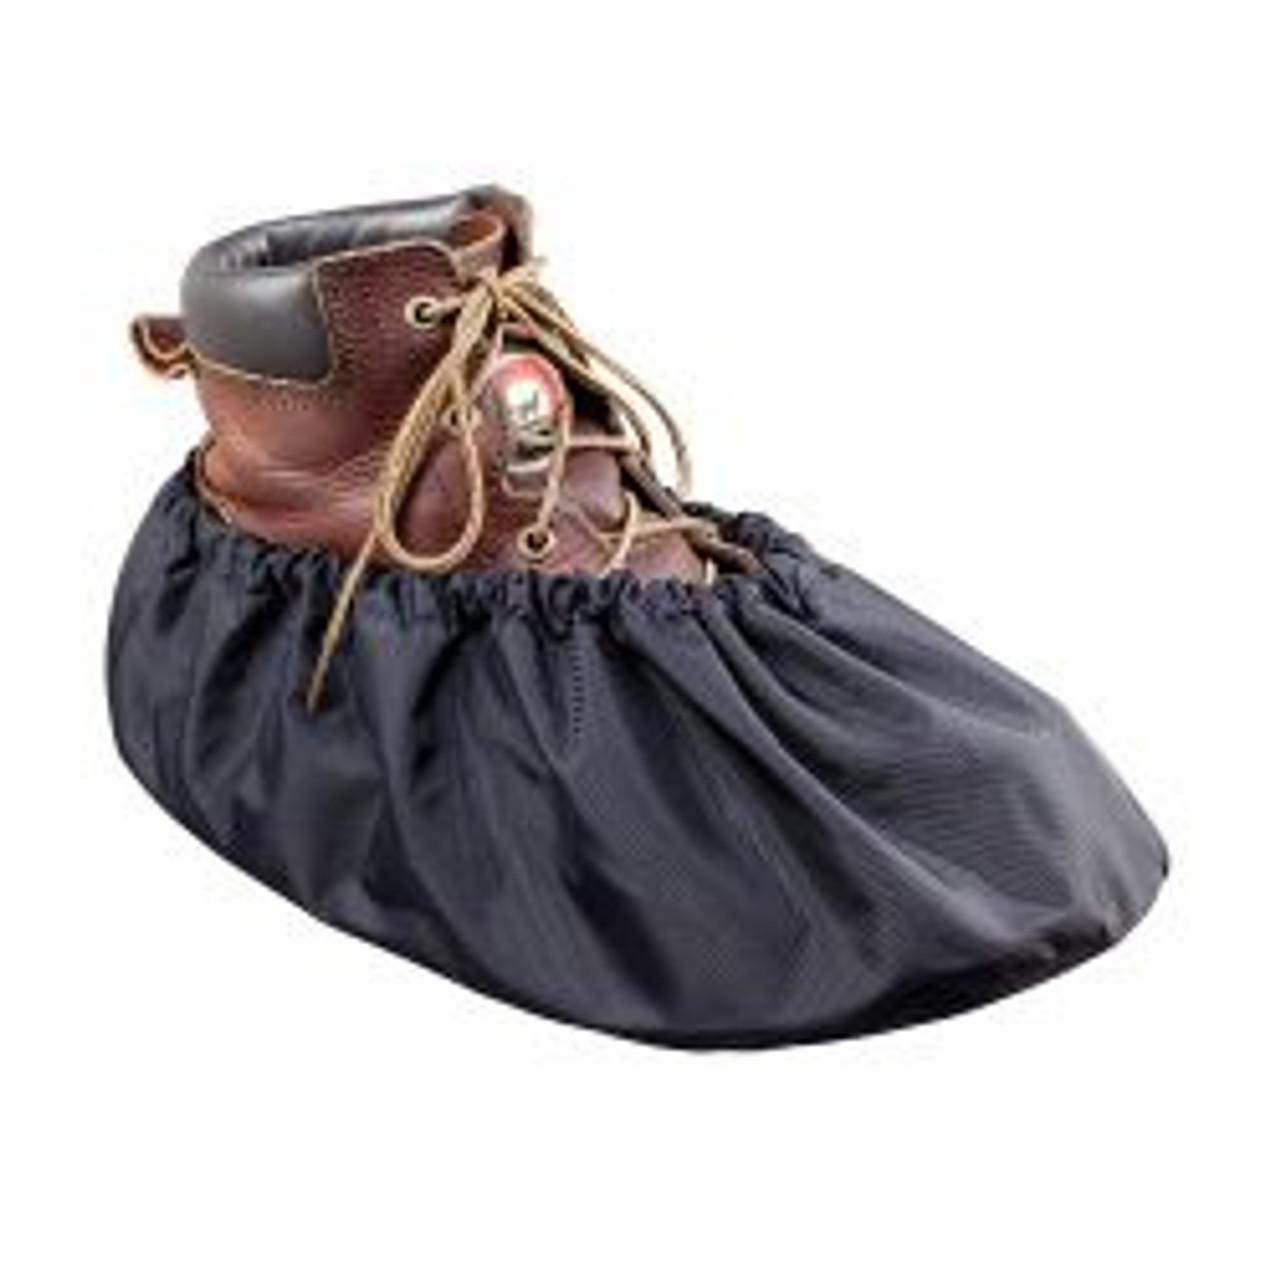 Klein Tradesman Pro Shoe Covers Large